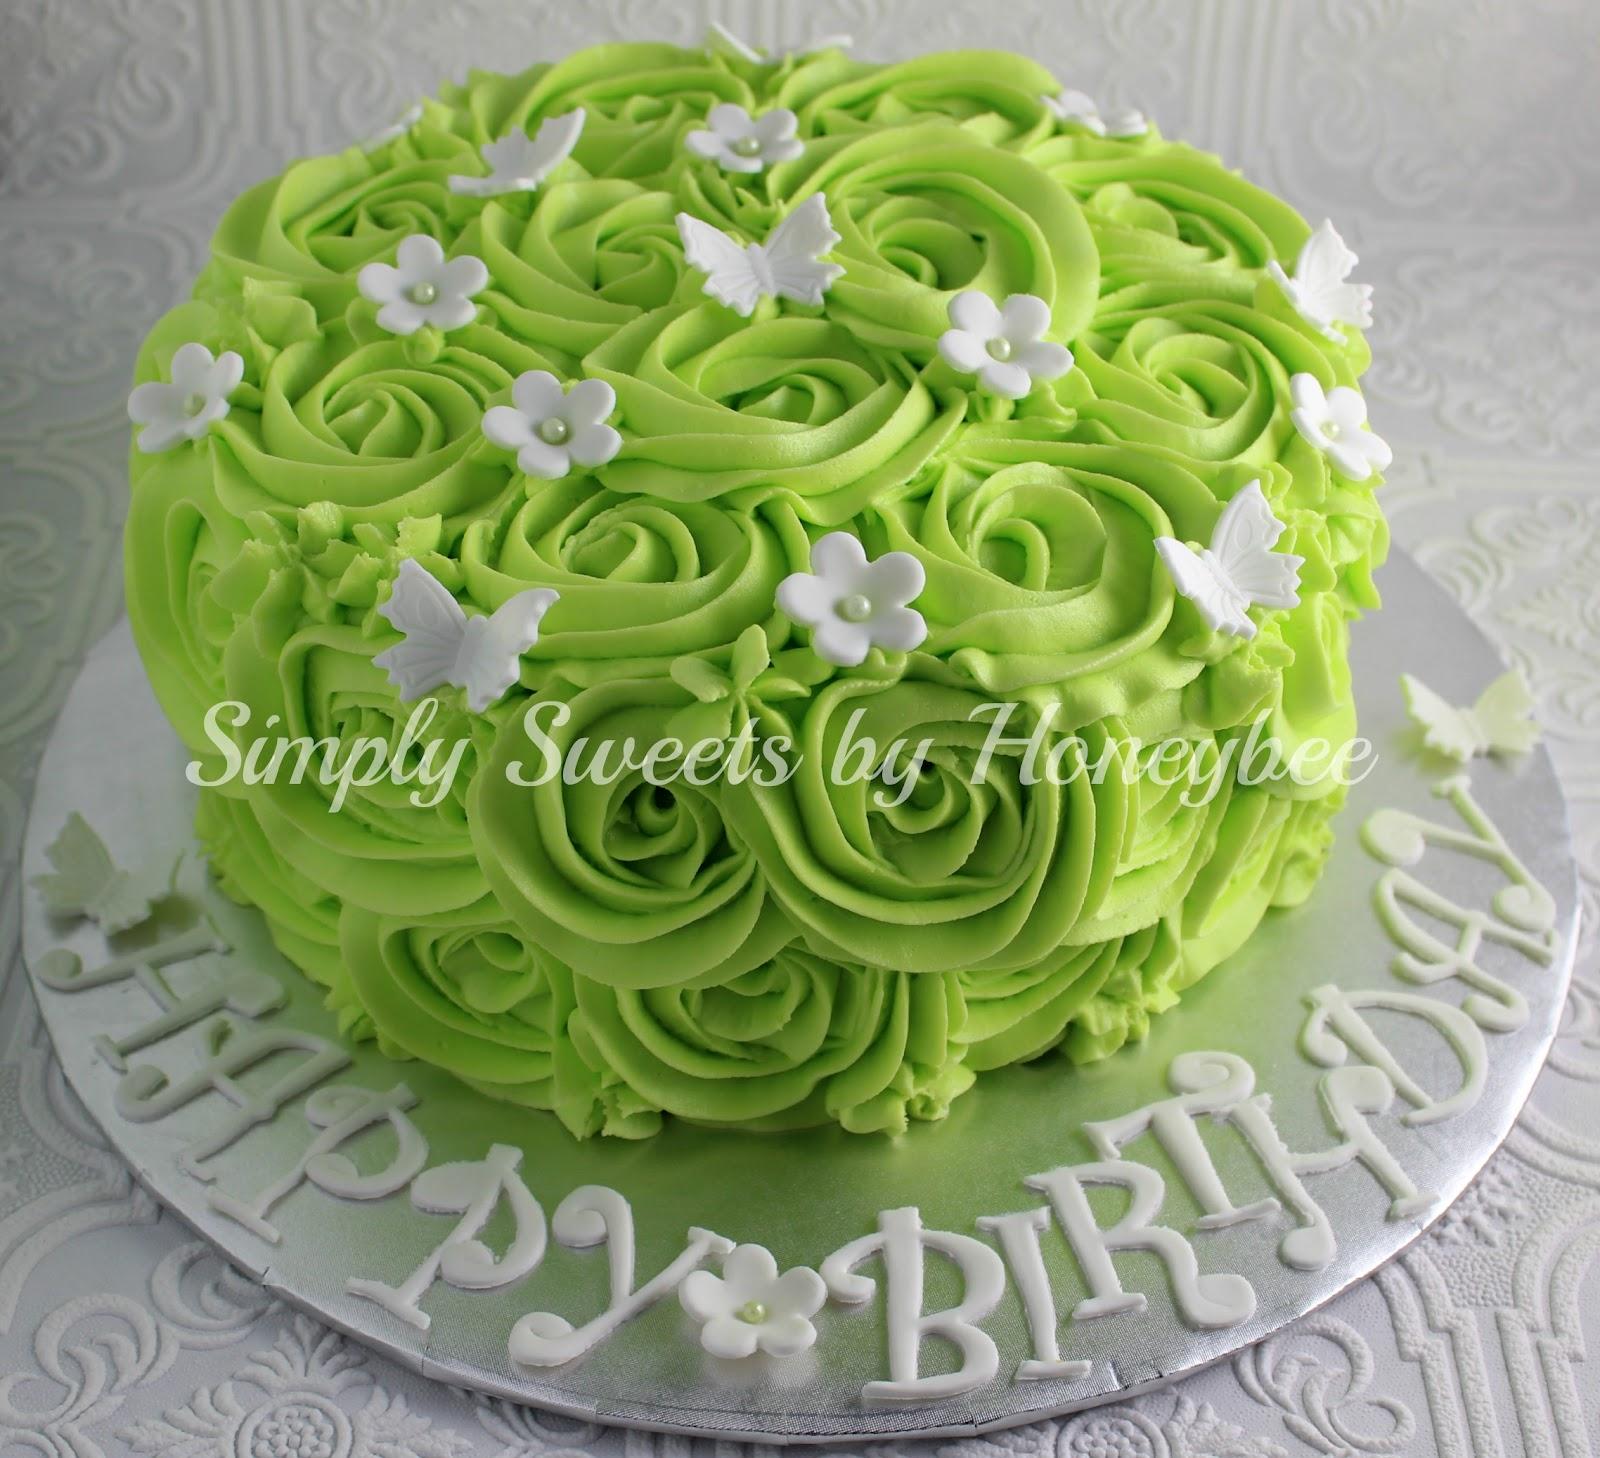 Rose Swirl Birthday Cake - simplysweetsbyhoneybee.com